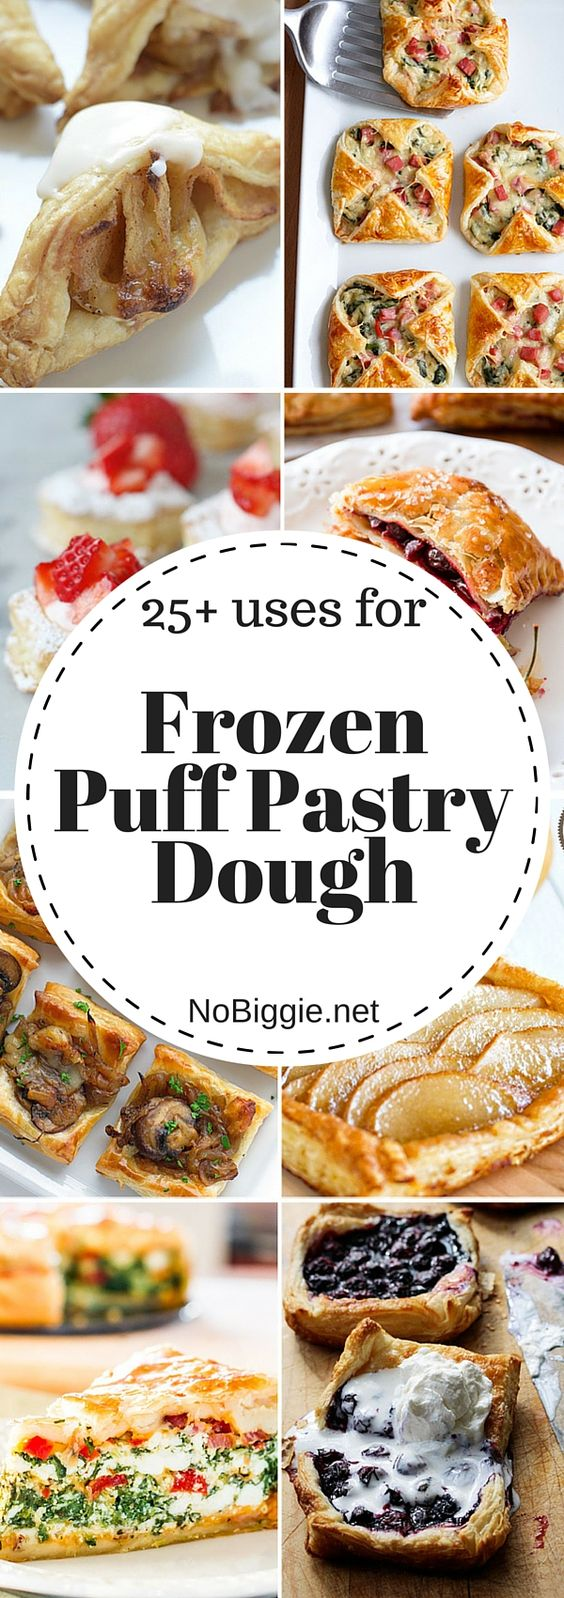 25+ Uses for Frozen Puff Pastry Dough | NoBiggie.net